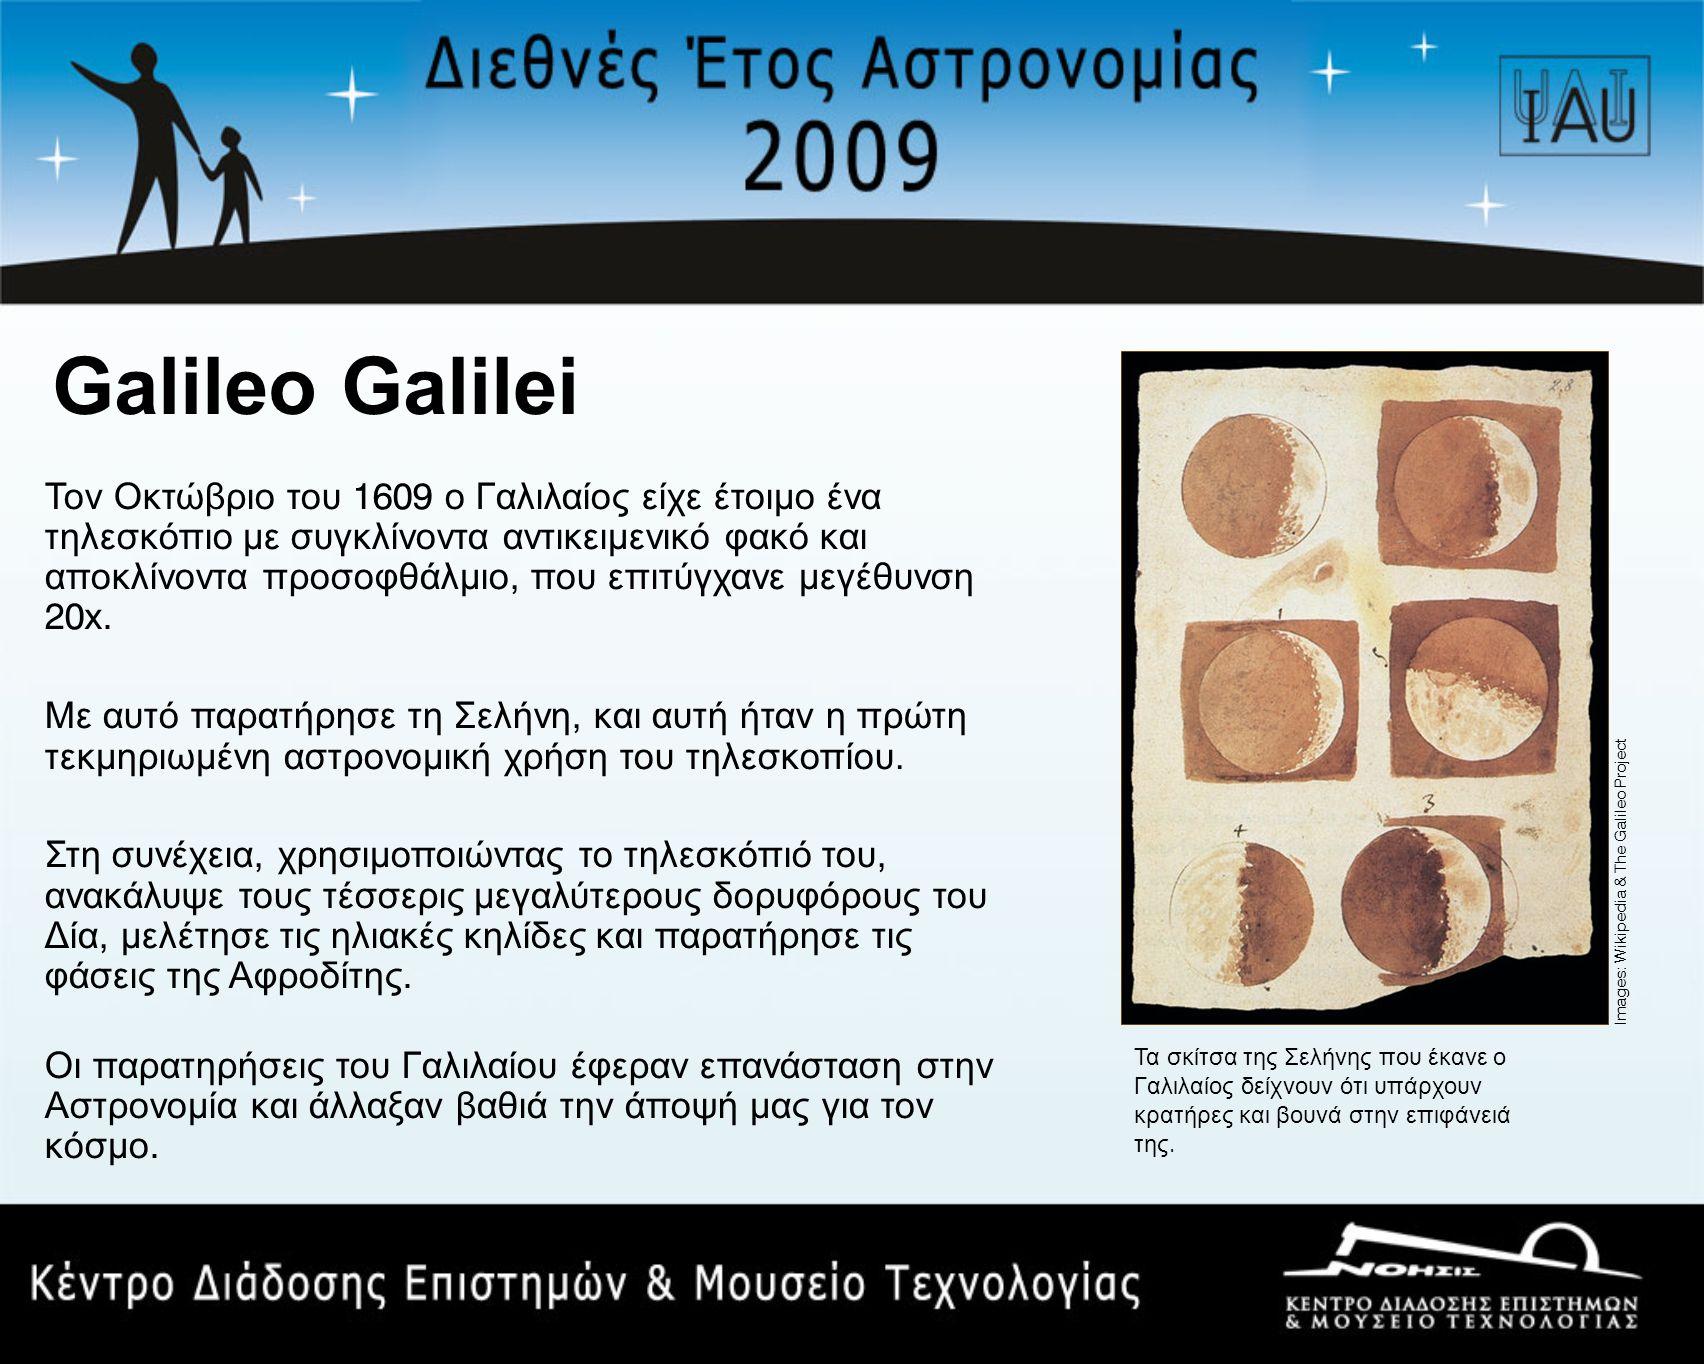 Galileo Galilei Τον Οκτώβριο του 1609 ο Γαλιλαίος είχε έτοιμο ένα τηλεσκόπιο με συγκλίνοντα αντικειμενικό φακό και αποκλίνοντα προσοφθάλμιο, που επιτύγχανε μεγέθυνση 20x.